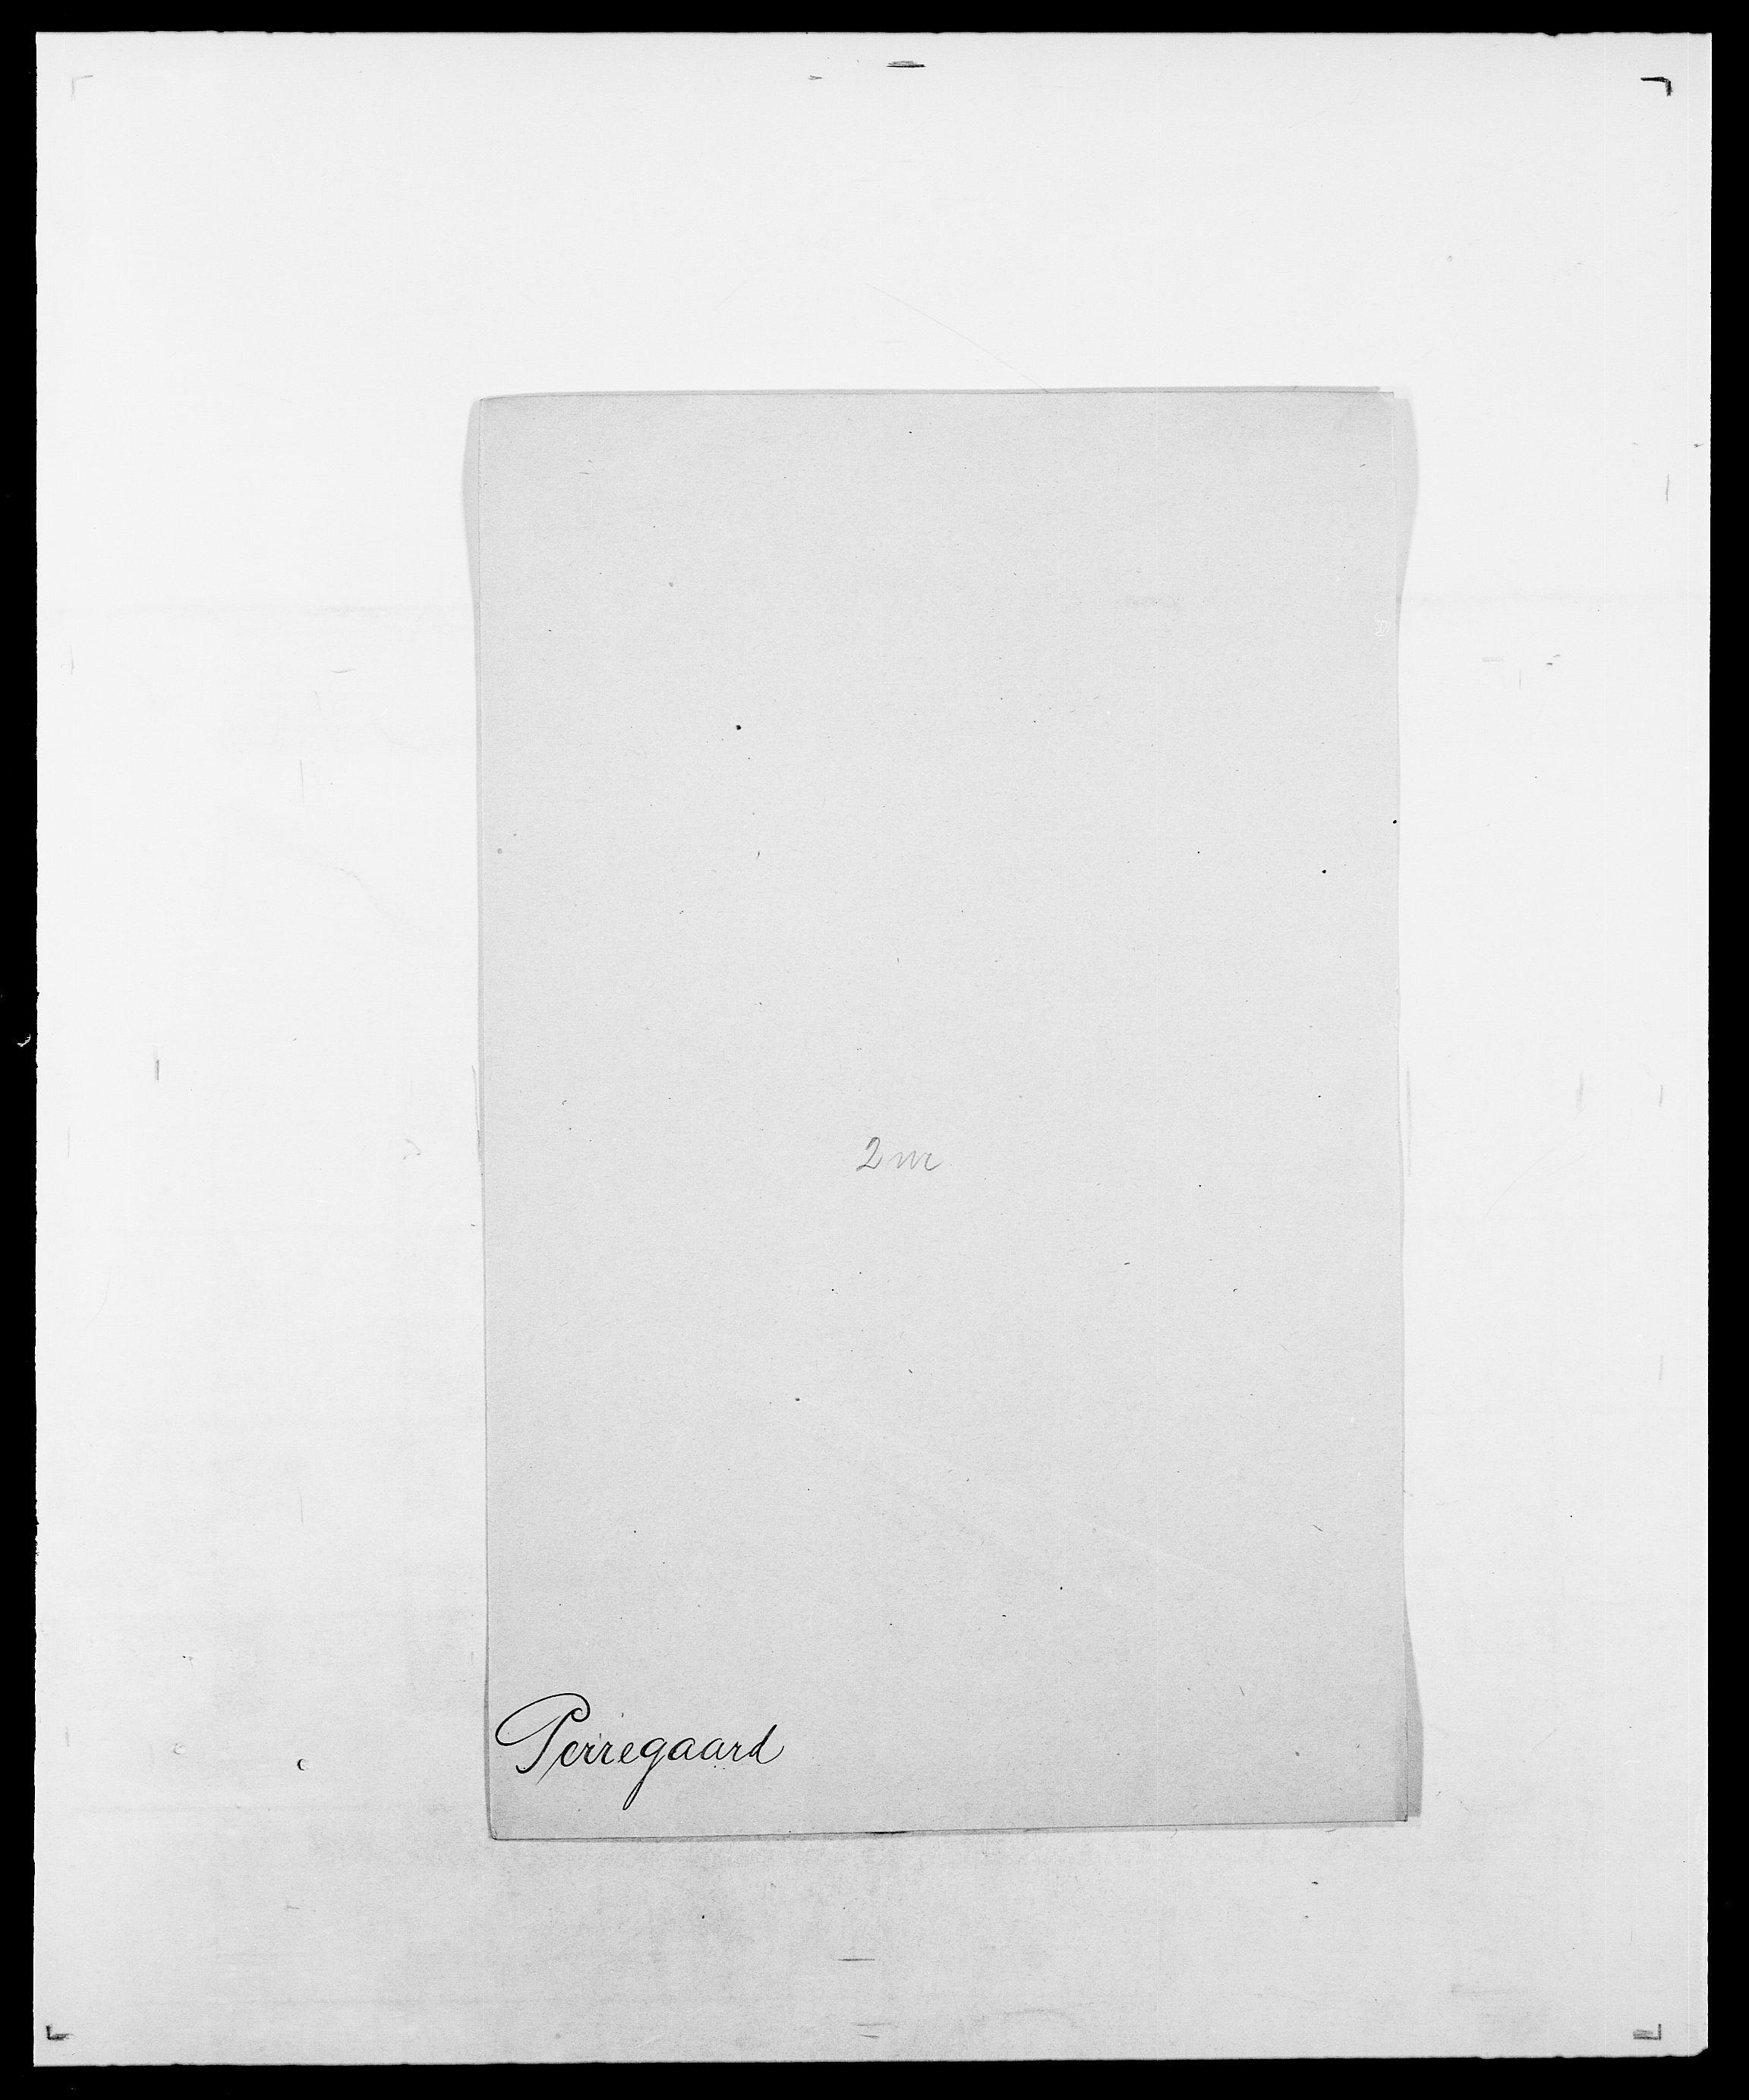 SAO, Delgobe, Charles Antoine - samling, D/Da/L0030: Paars - Pittelkov, s. 367